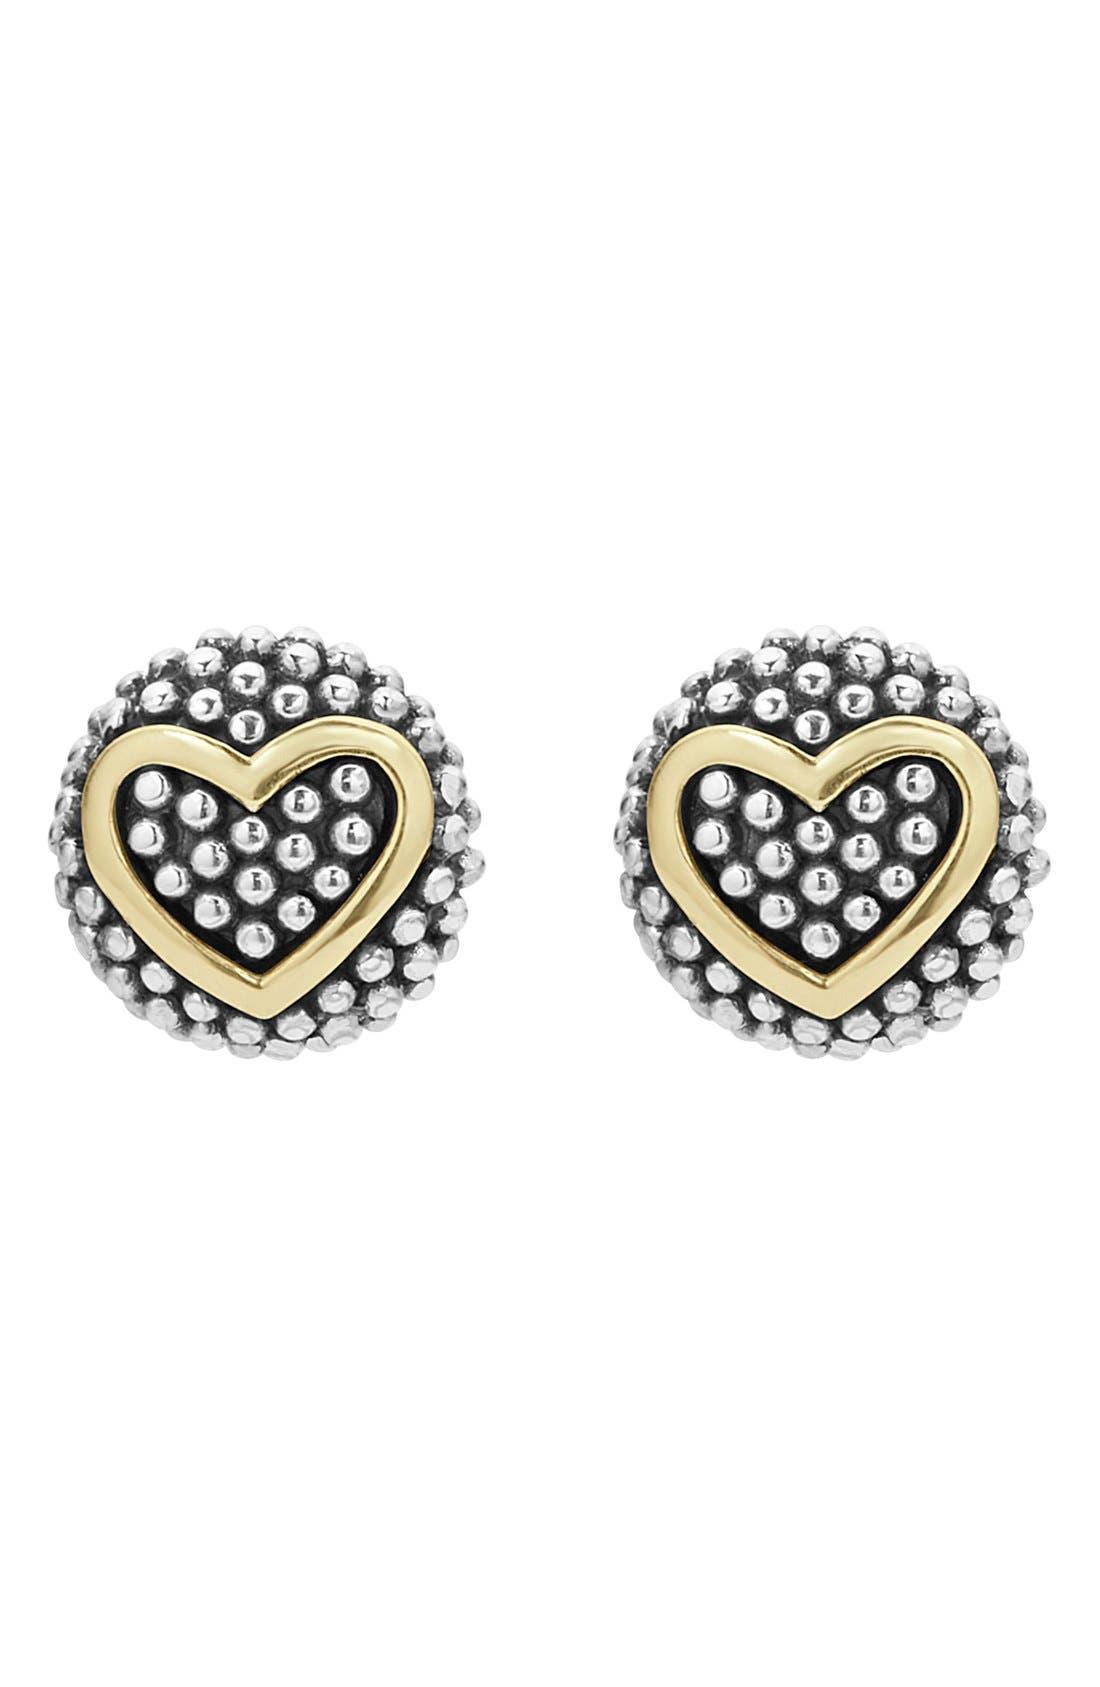 'Caviar' Heart Stud Earrings,                             Main thumbnail 1, color,                             SILVER/ GOLD